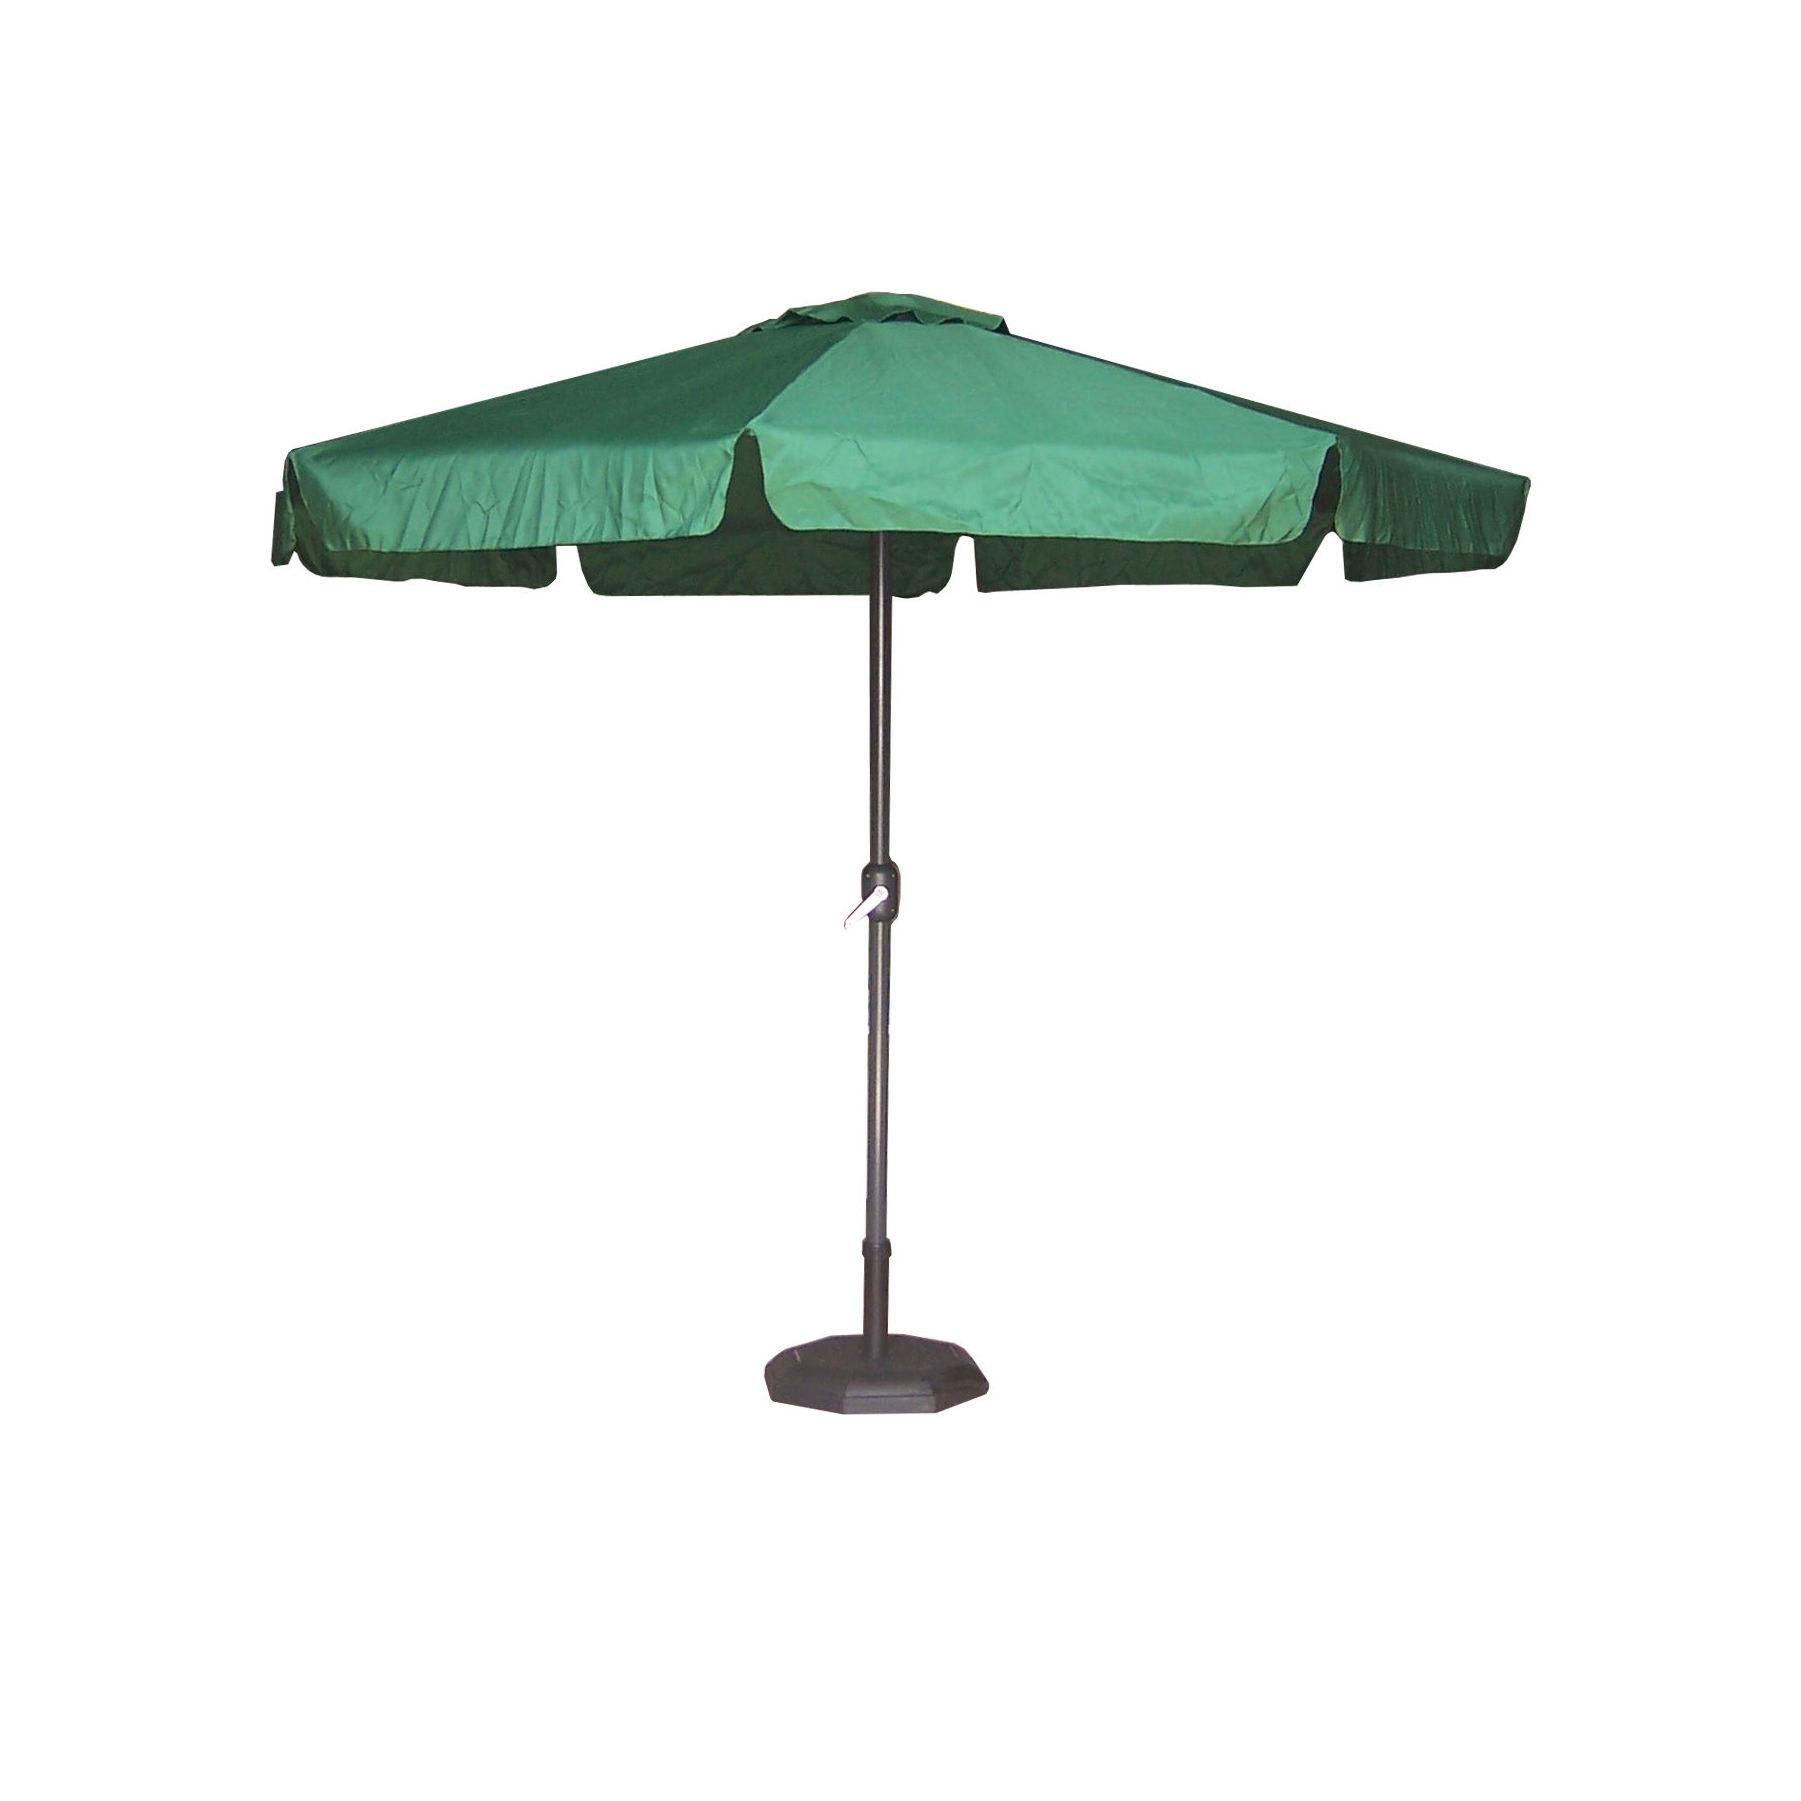 Parasol: Alquiler de mobiliario de Stuhl Ibérica Alquiler de Mobiliario